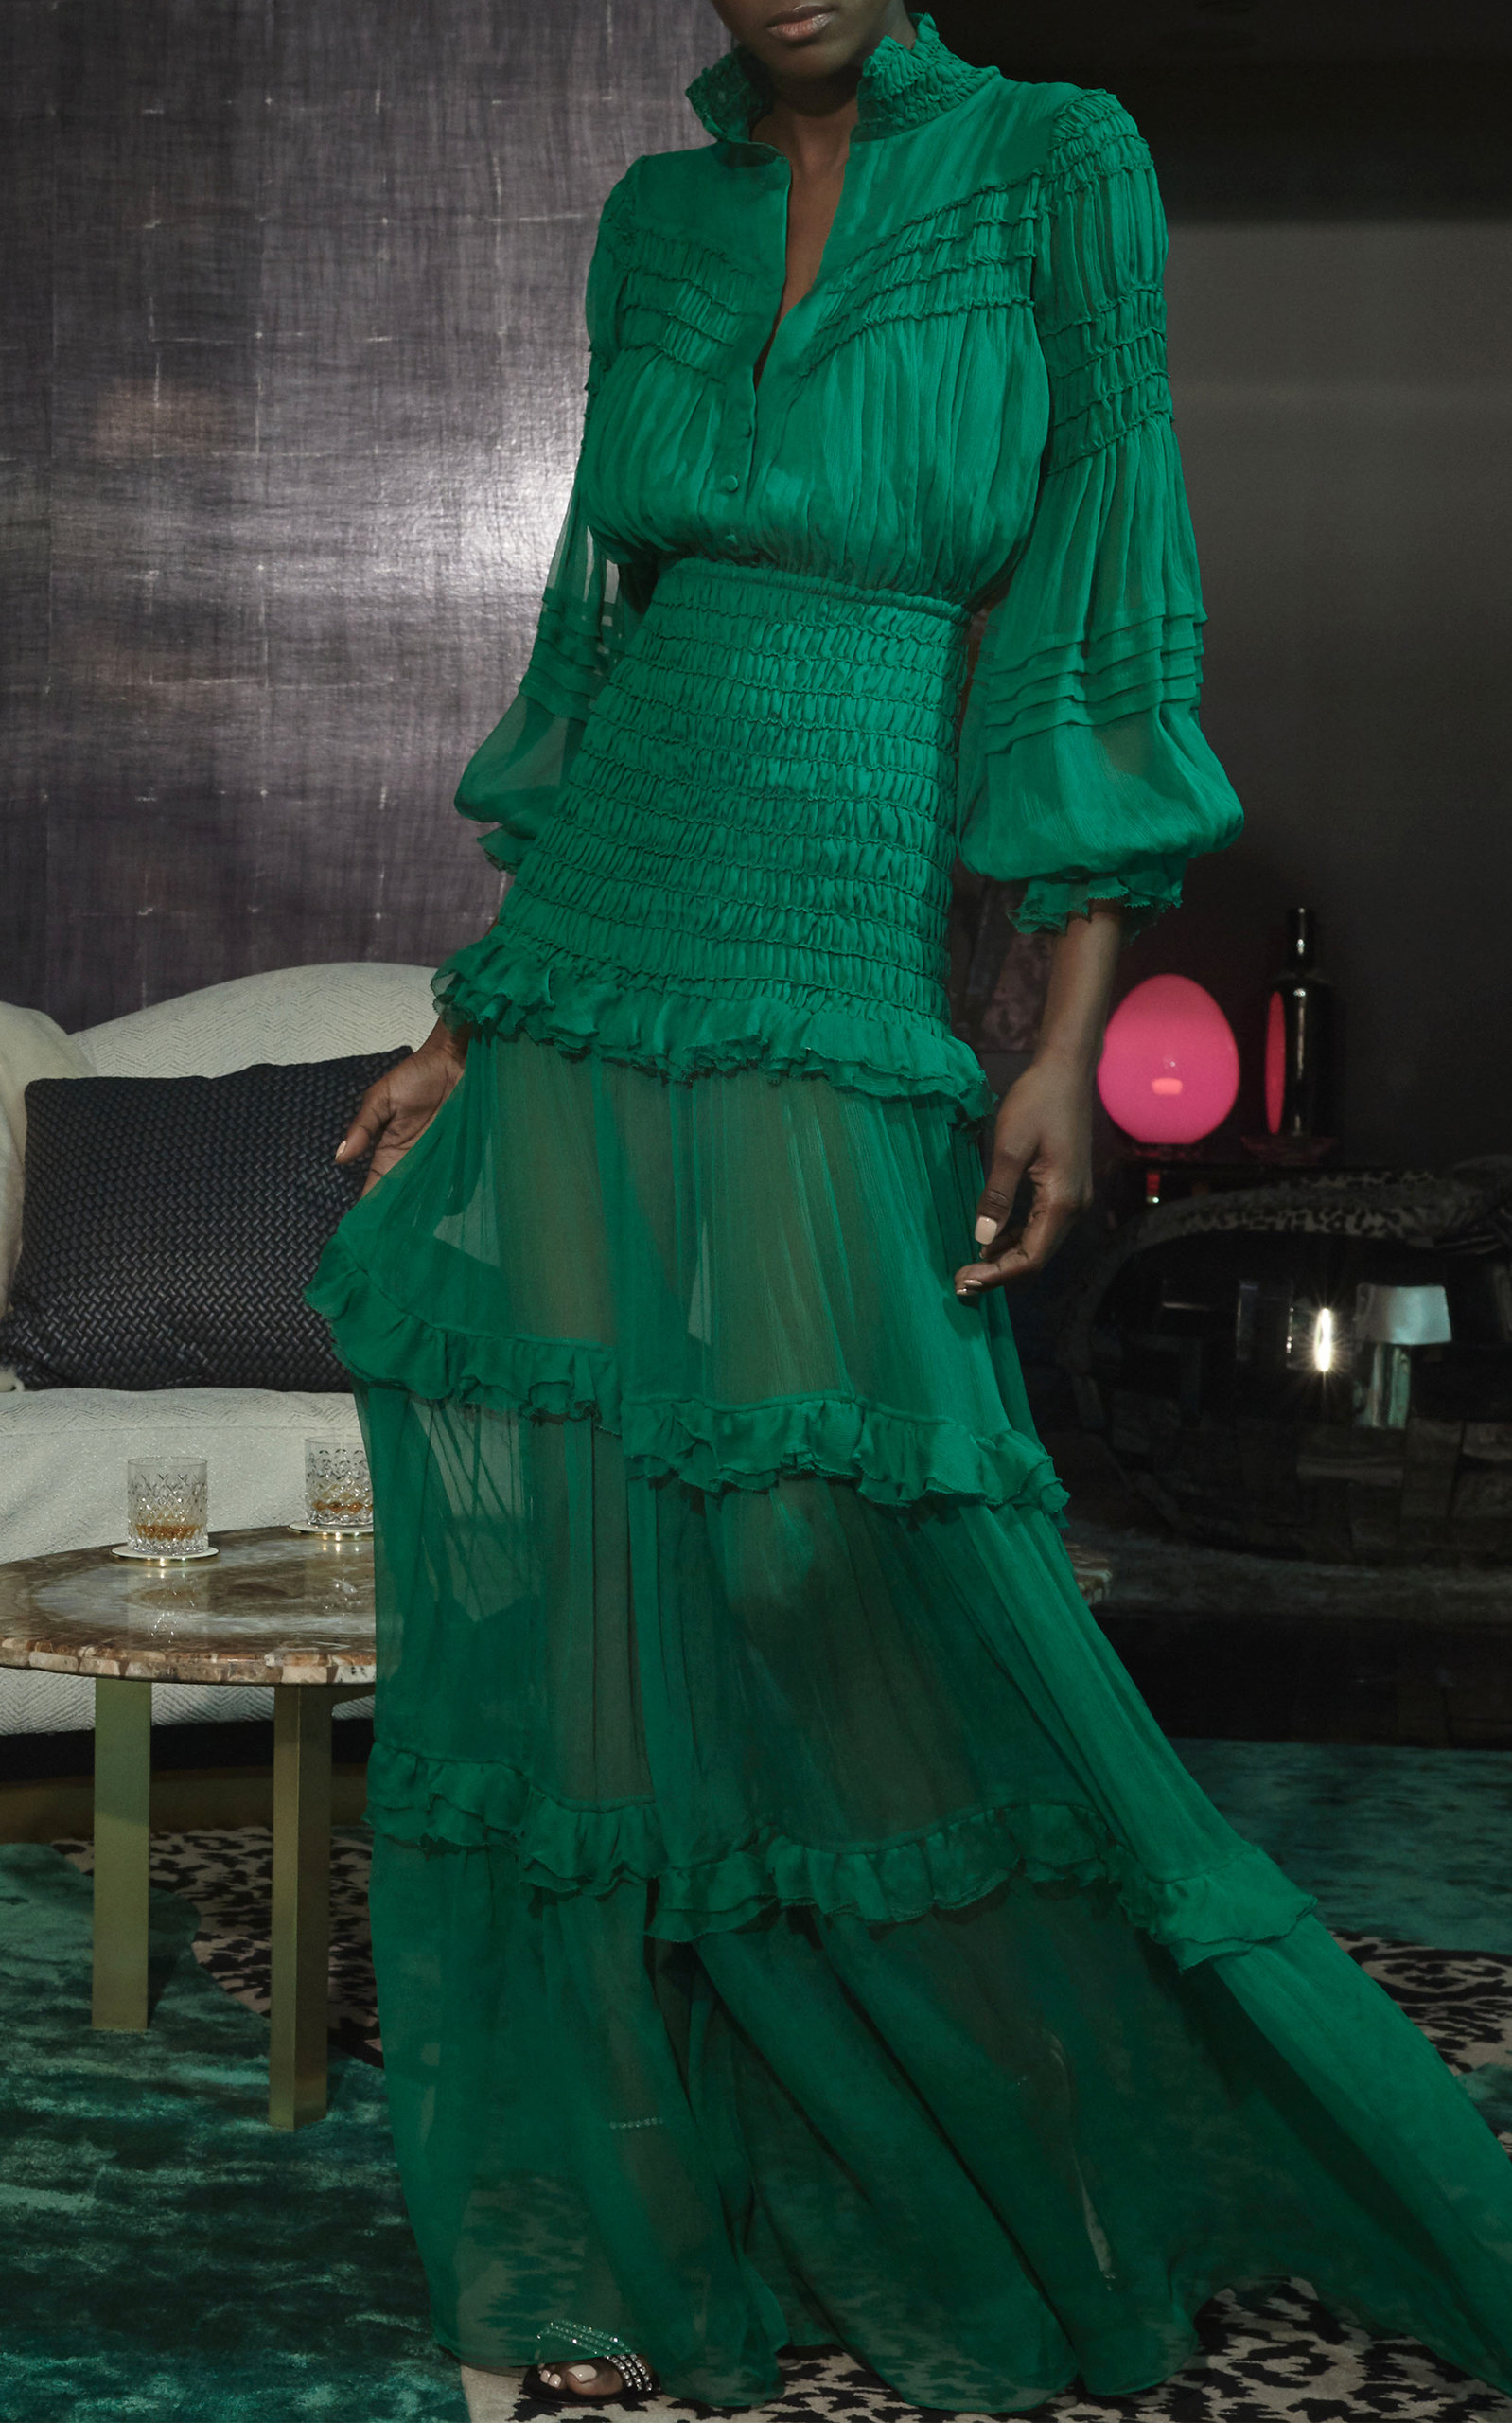 19595e42e6a6 AlexisSinclair Ruffled Silk-Chiffon Maxi Dress. CLOSE. Loading. Loading.  Loading. Loading